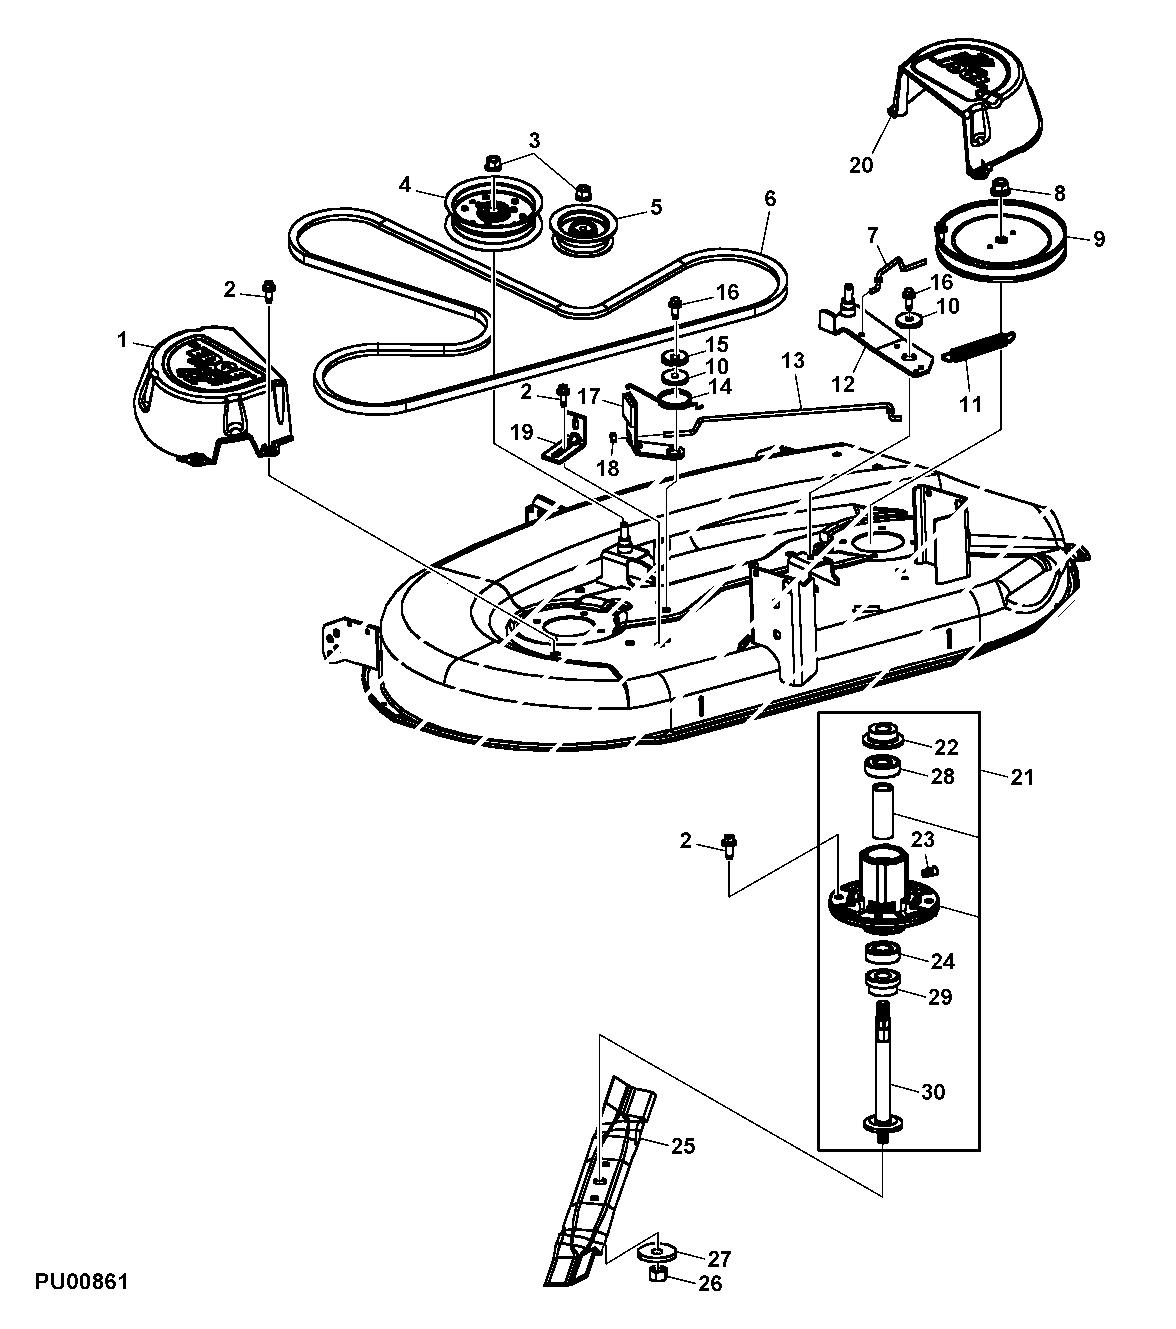 John Deere 210 Lawn Tractor Wiring Diagram Fl70 Fuse Box